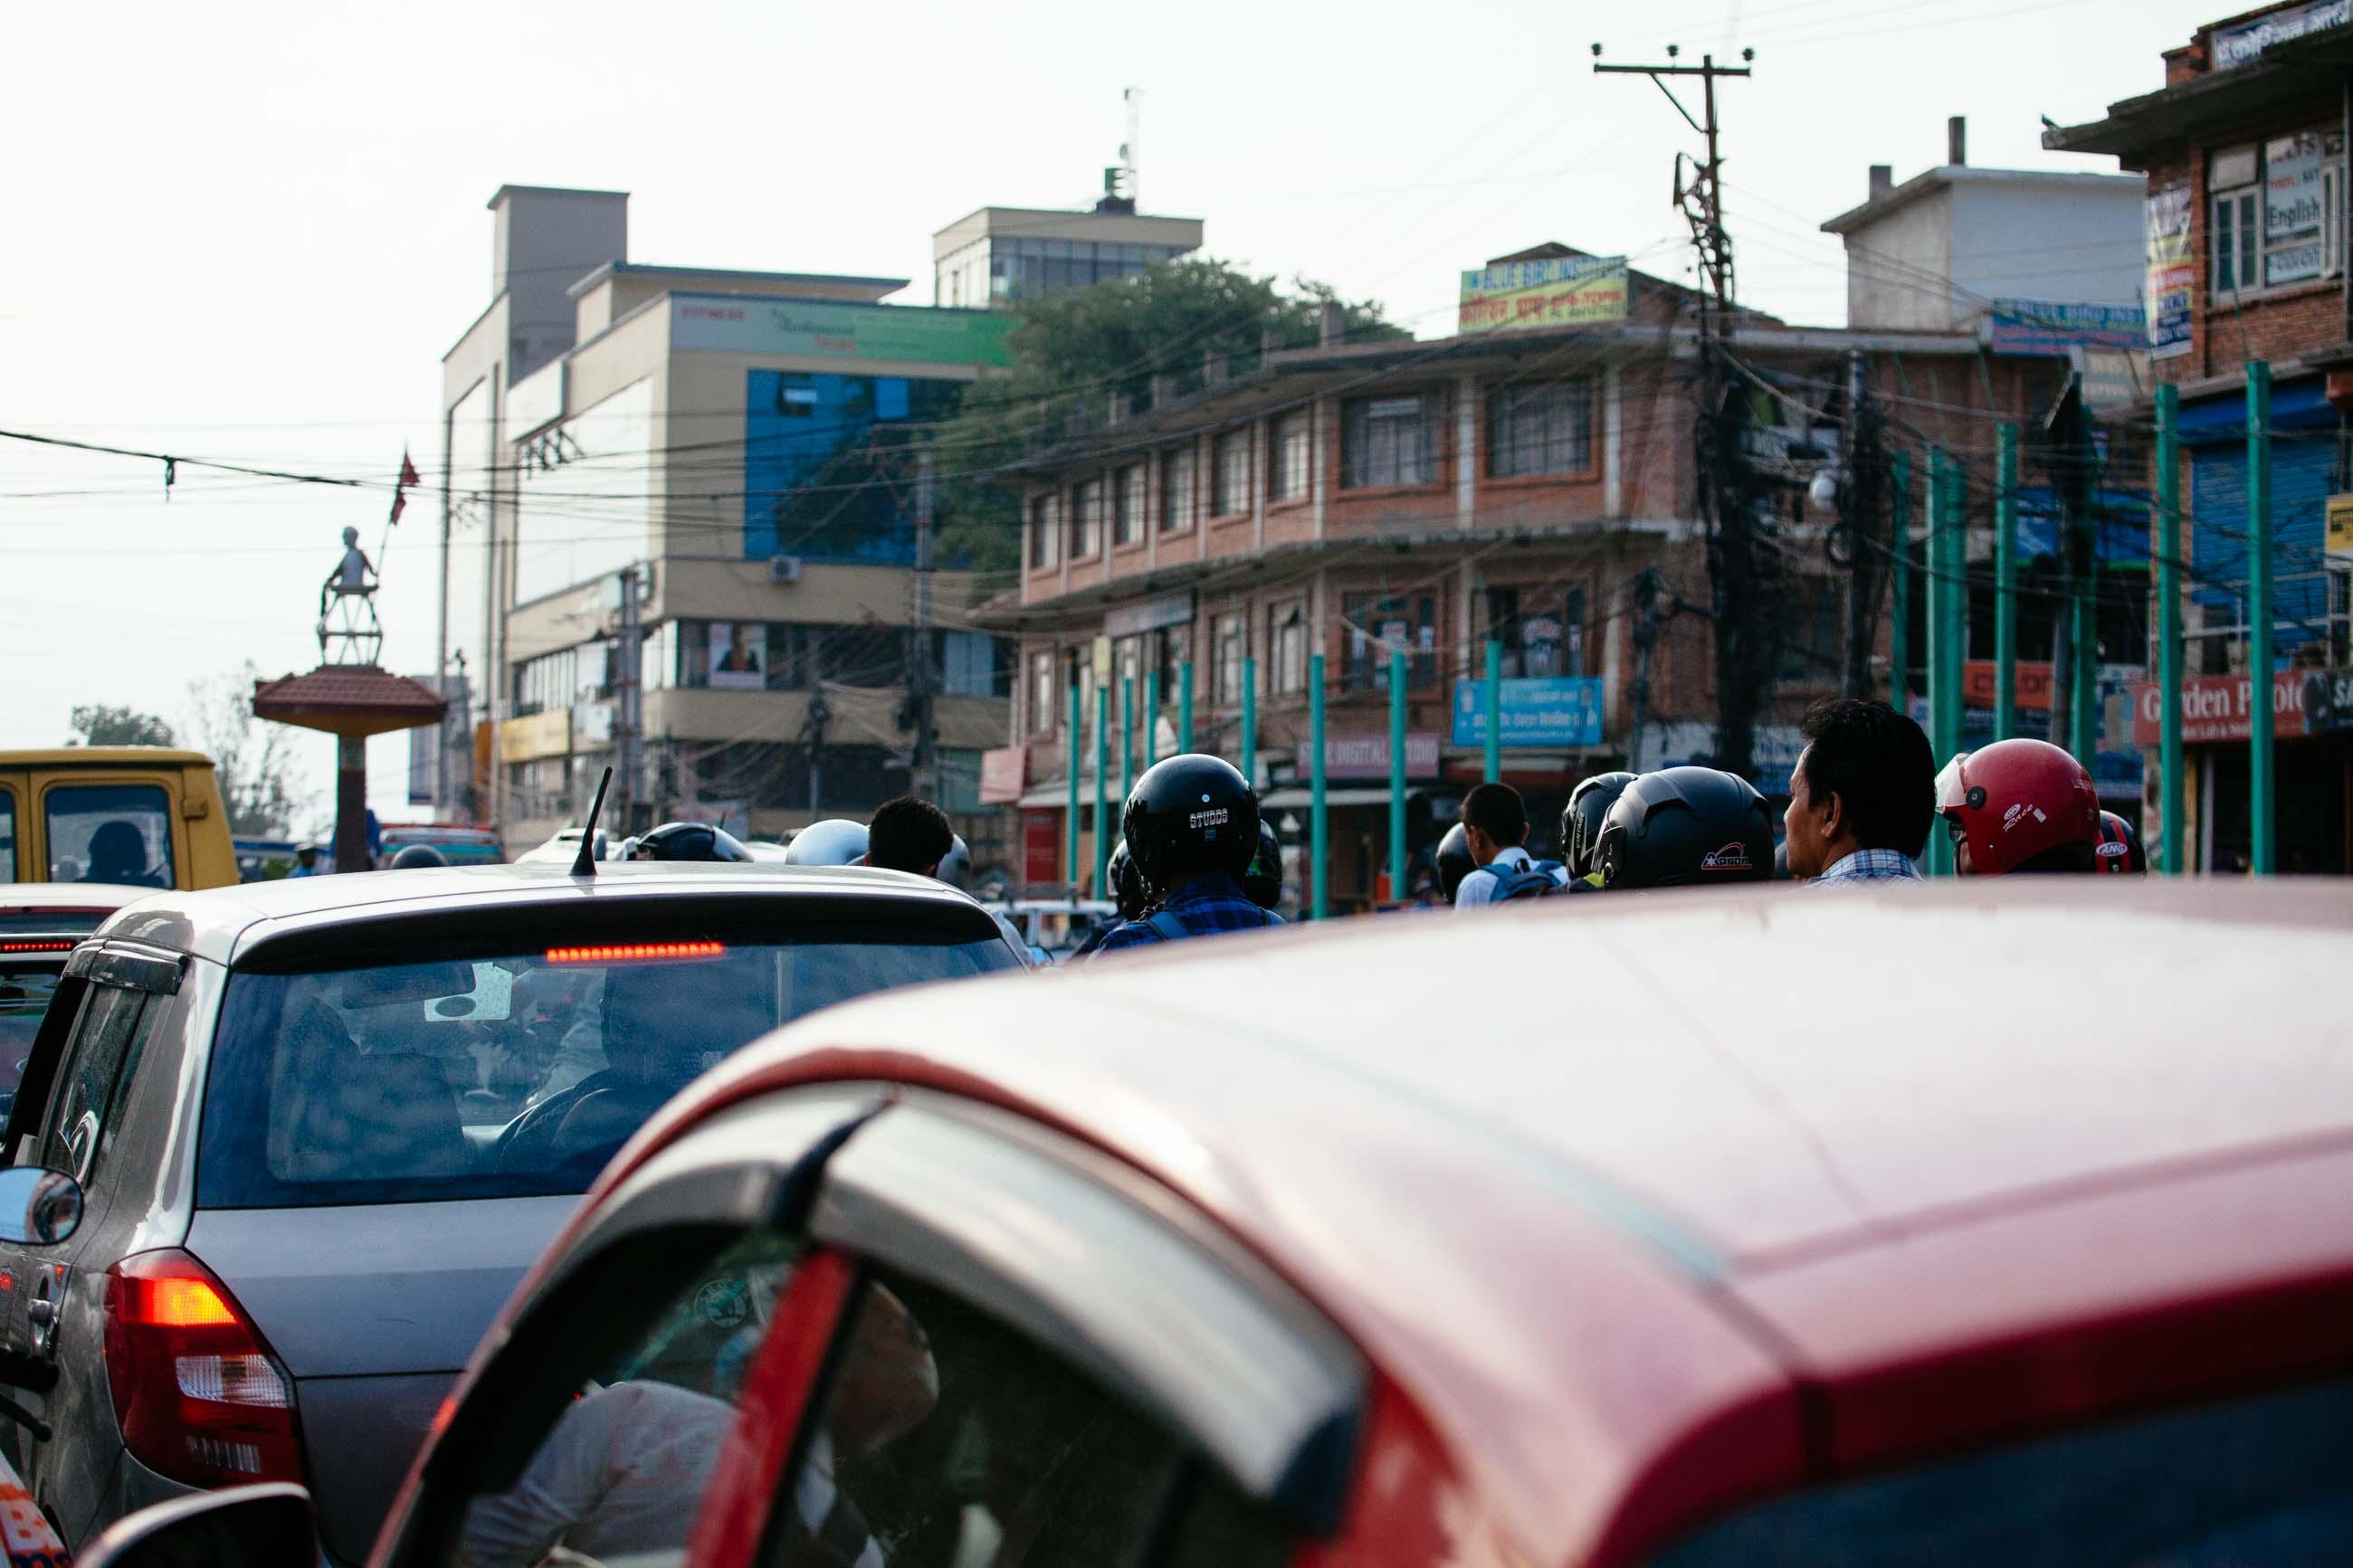 Kathmandu Traffic, Nepal, Jun 2015